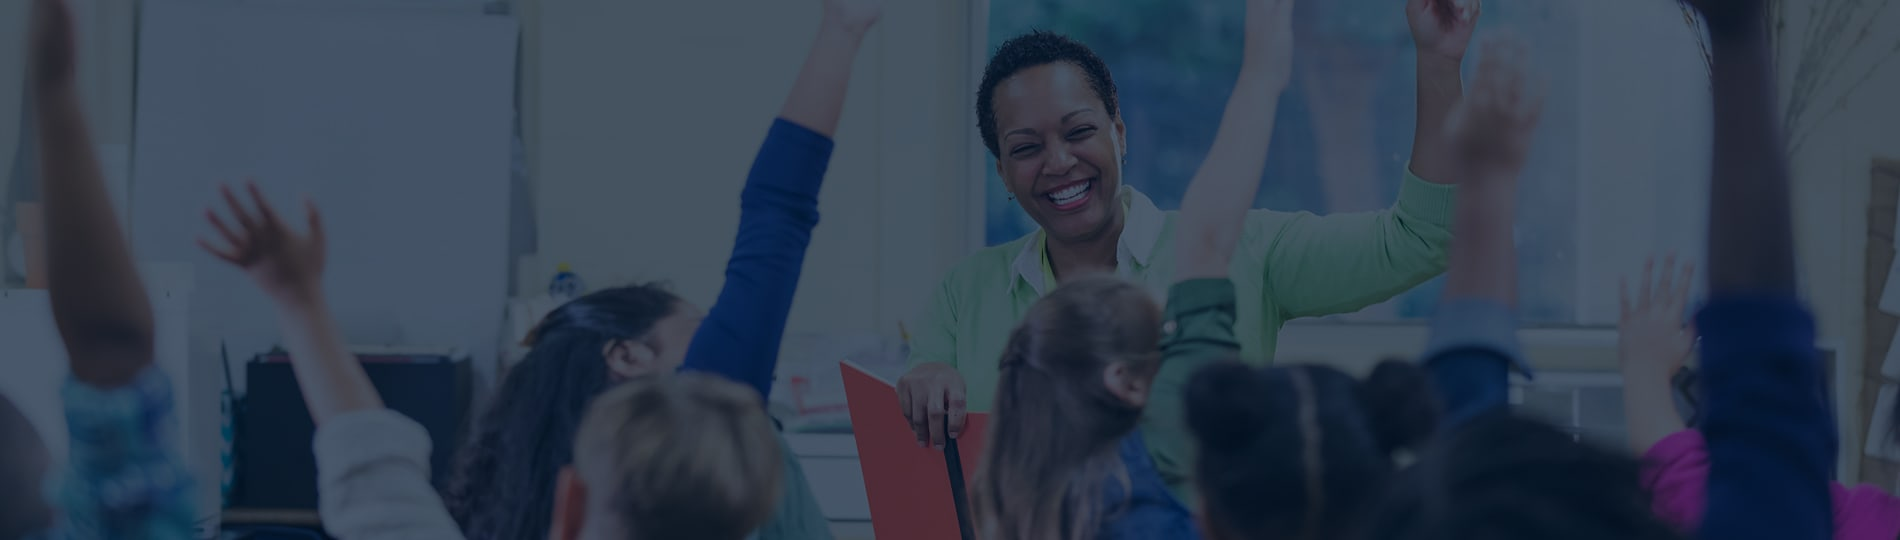 Background Screening for Educators & Universities